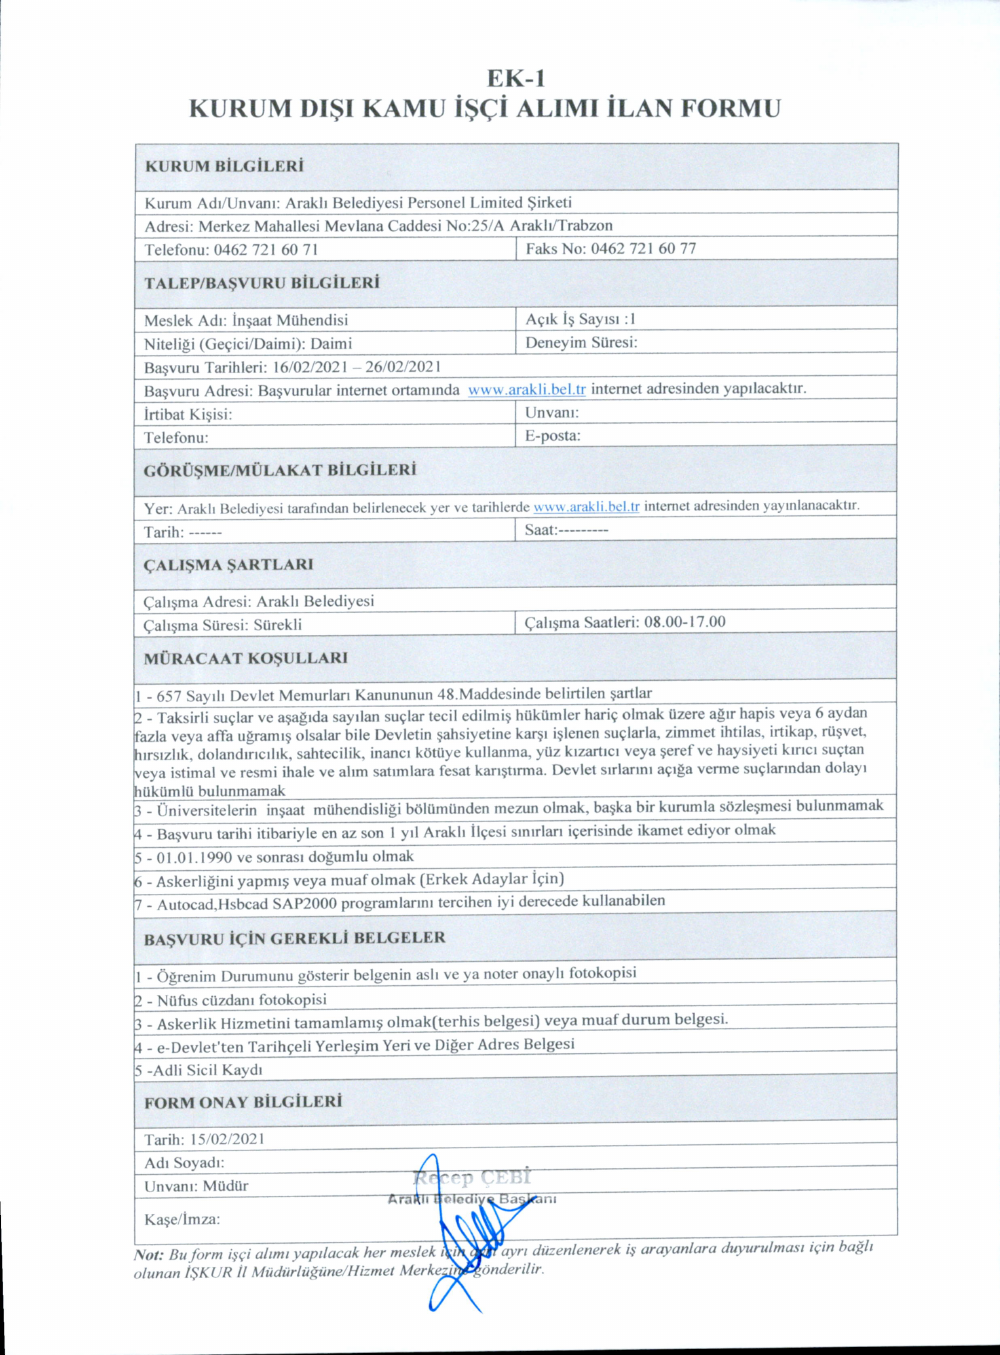 trabzon-arakli-belediyesi-per-ltd-sti-26-02-2021-000007.png